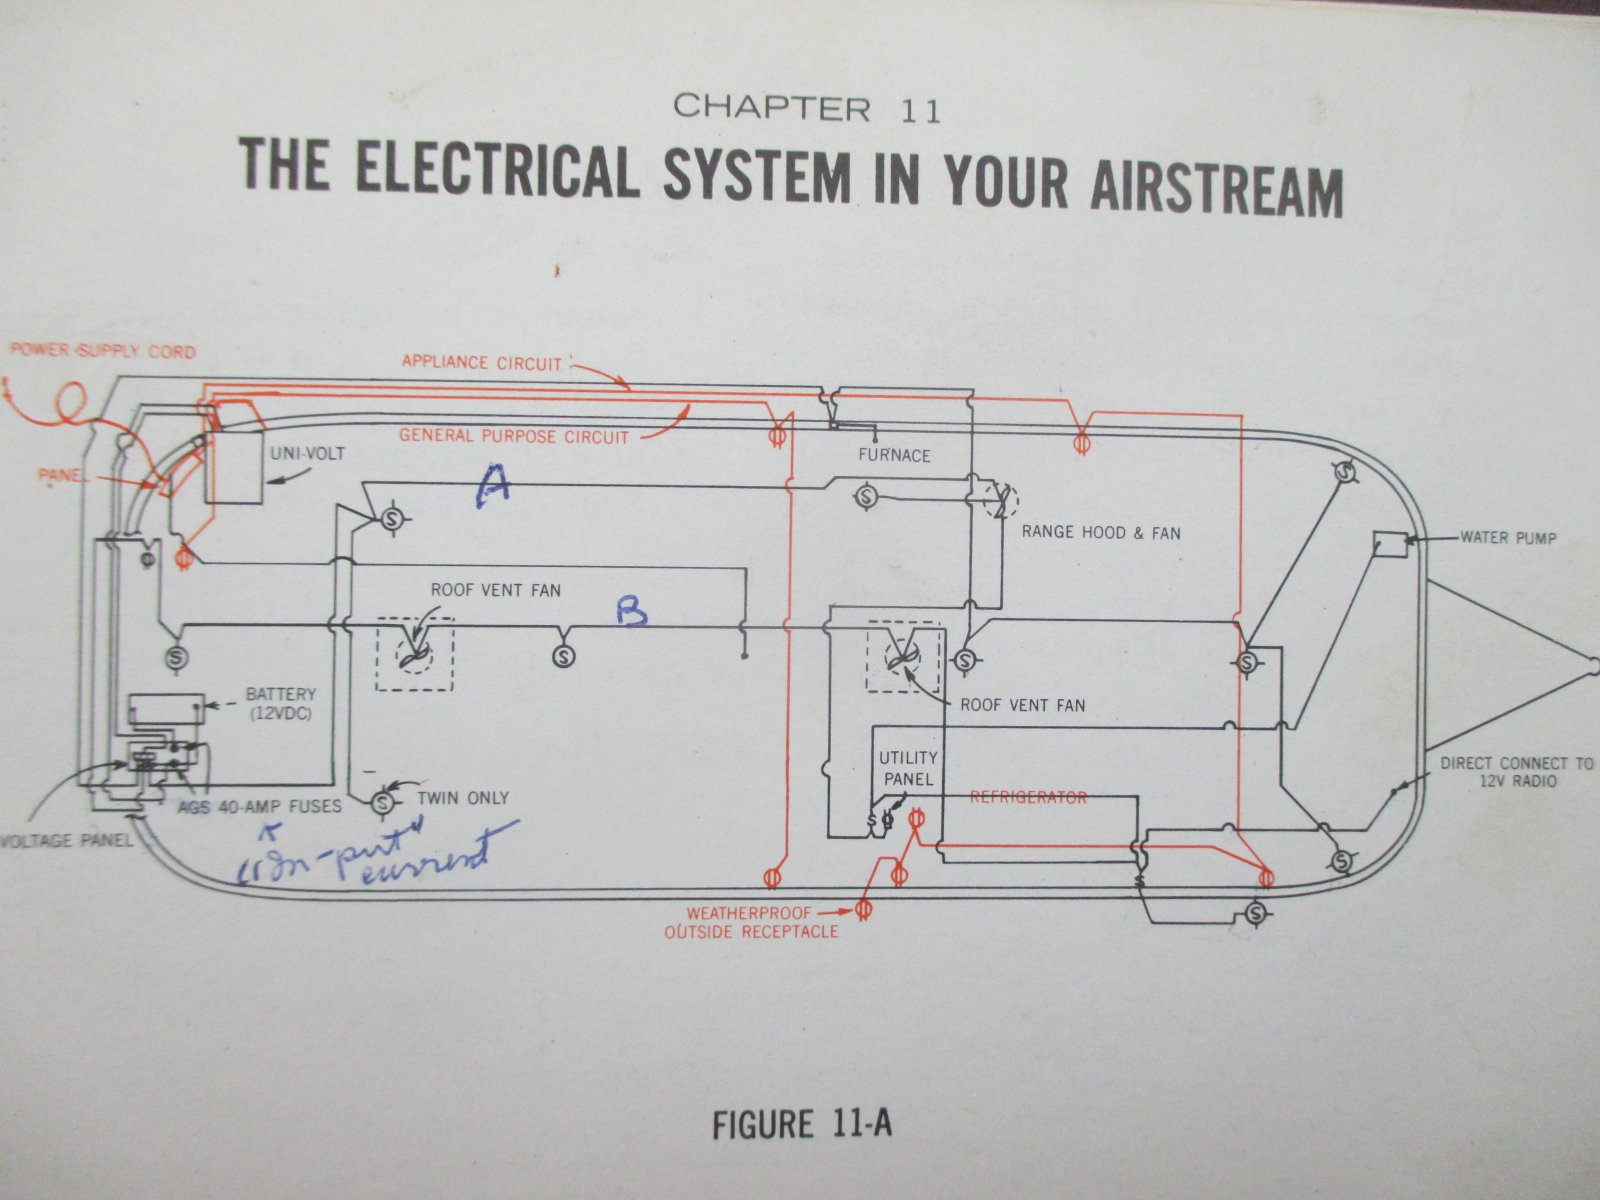 [DIAGRAM_3NM]  5B599 Vintage Camper Light Wiring Diagram | Wiring Library | Vintage Camper Wiring Diagram |  | Wiring Library